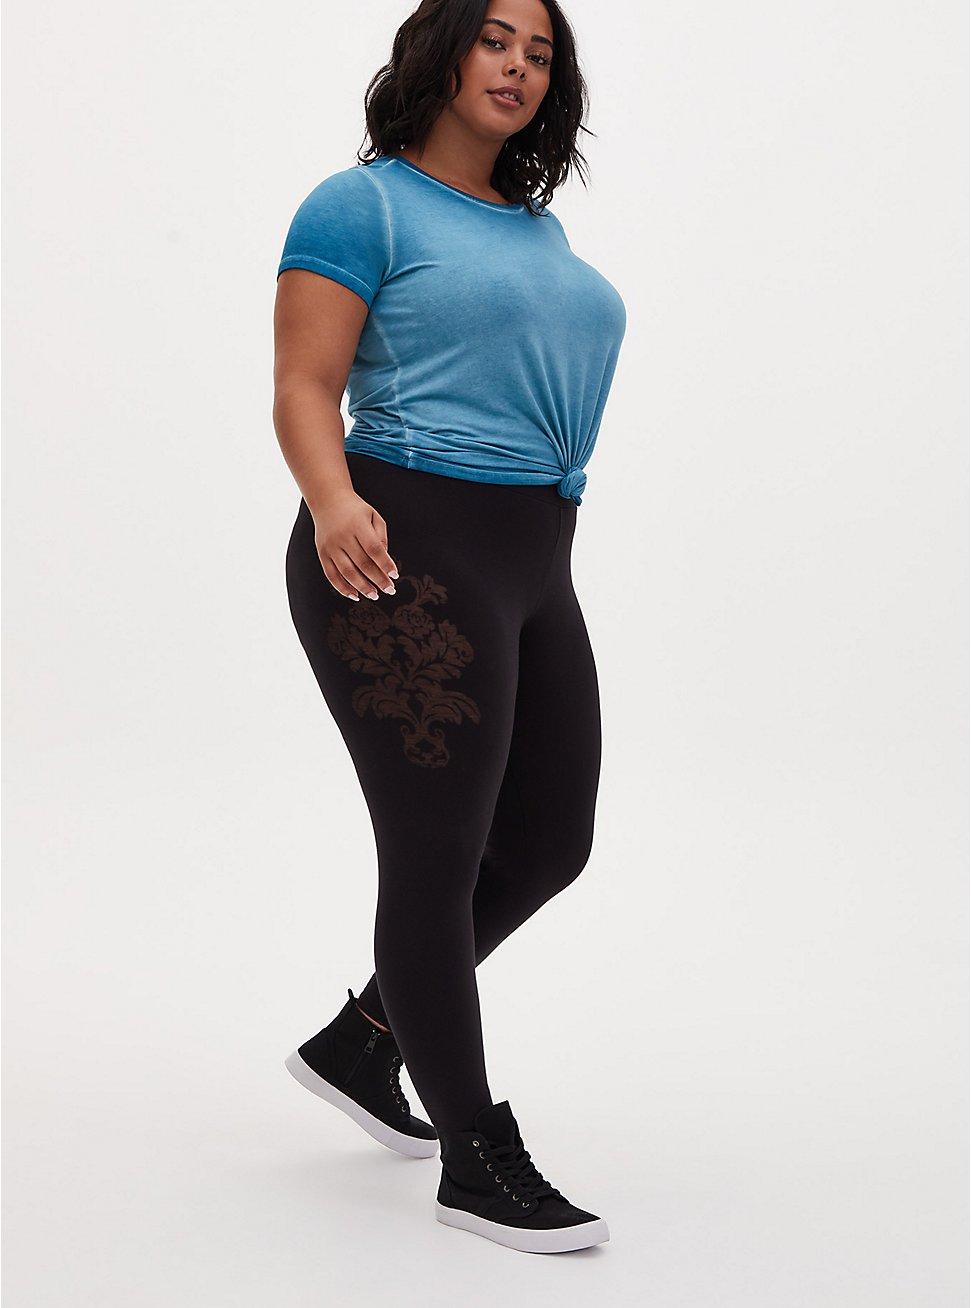 Premium Legging - Heart & Floral Filigree Black, BLACK, hi-res